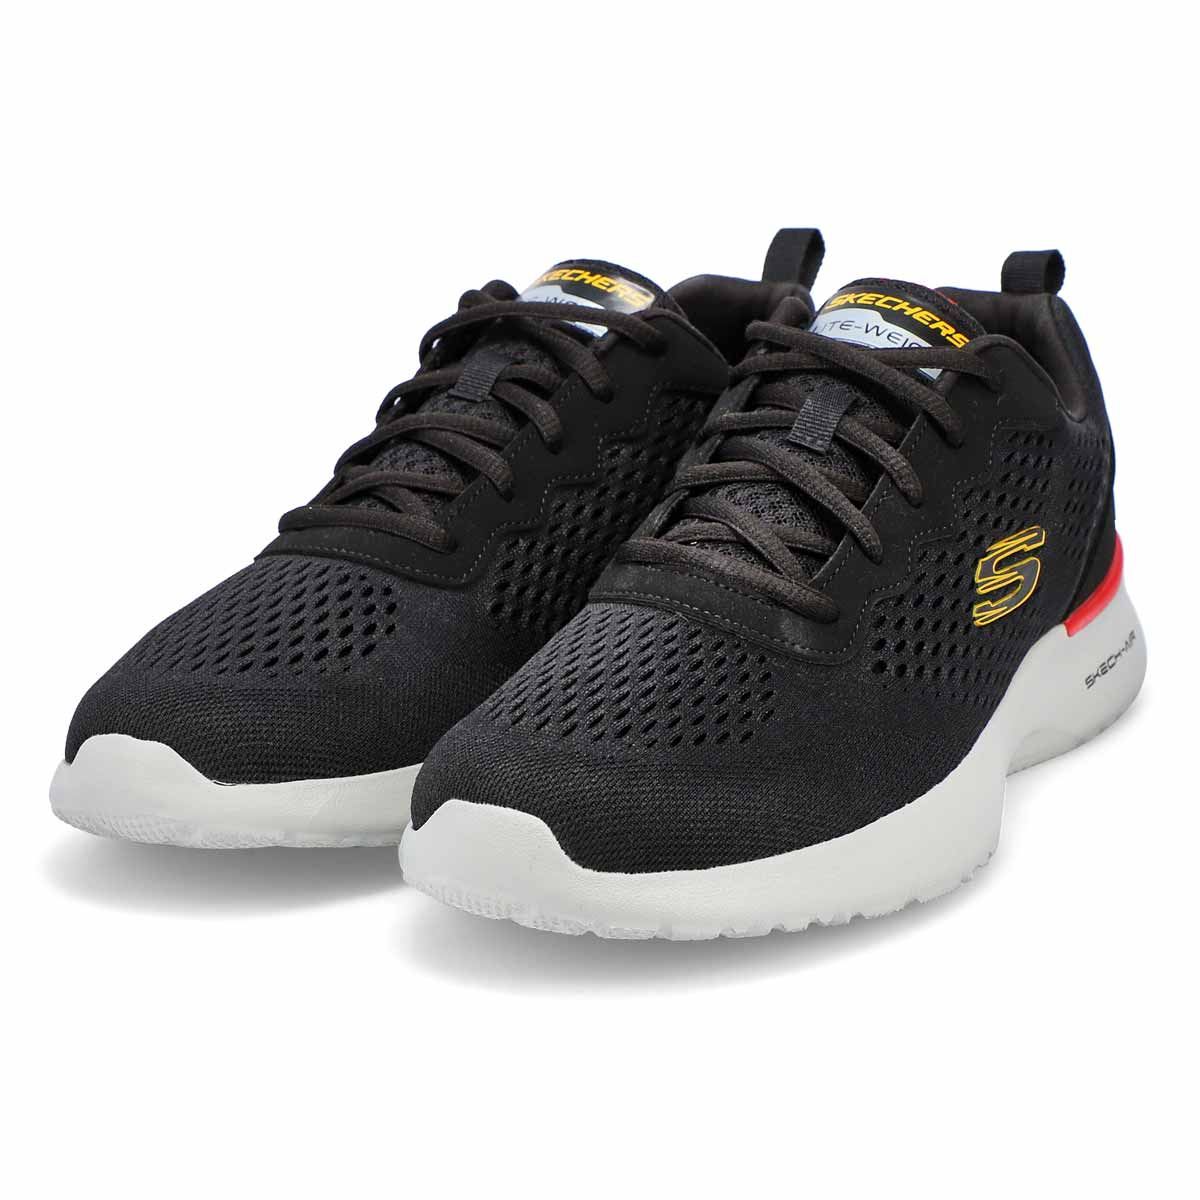 Men's Skech-Air Dynamight Sneaker - Black